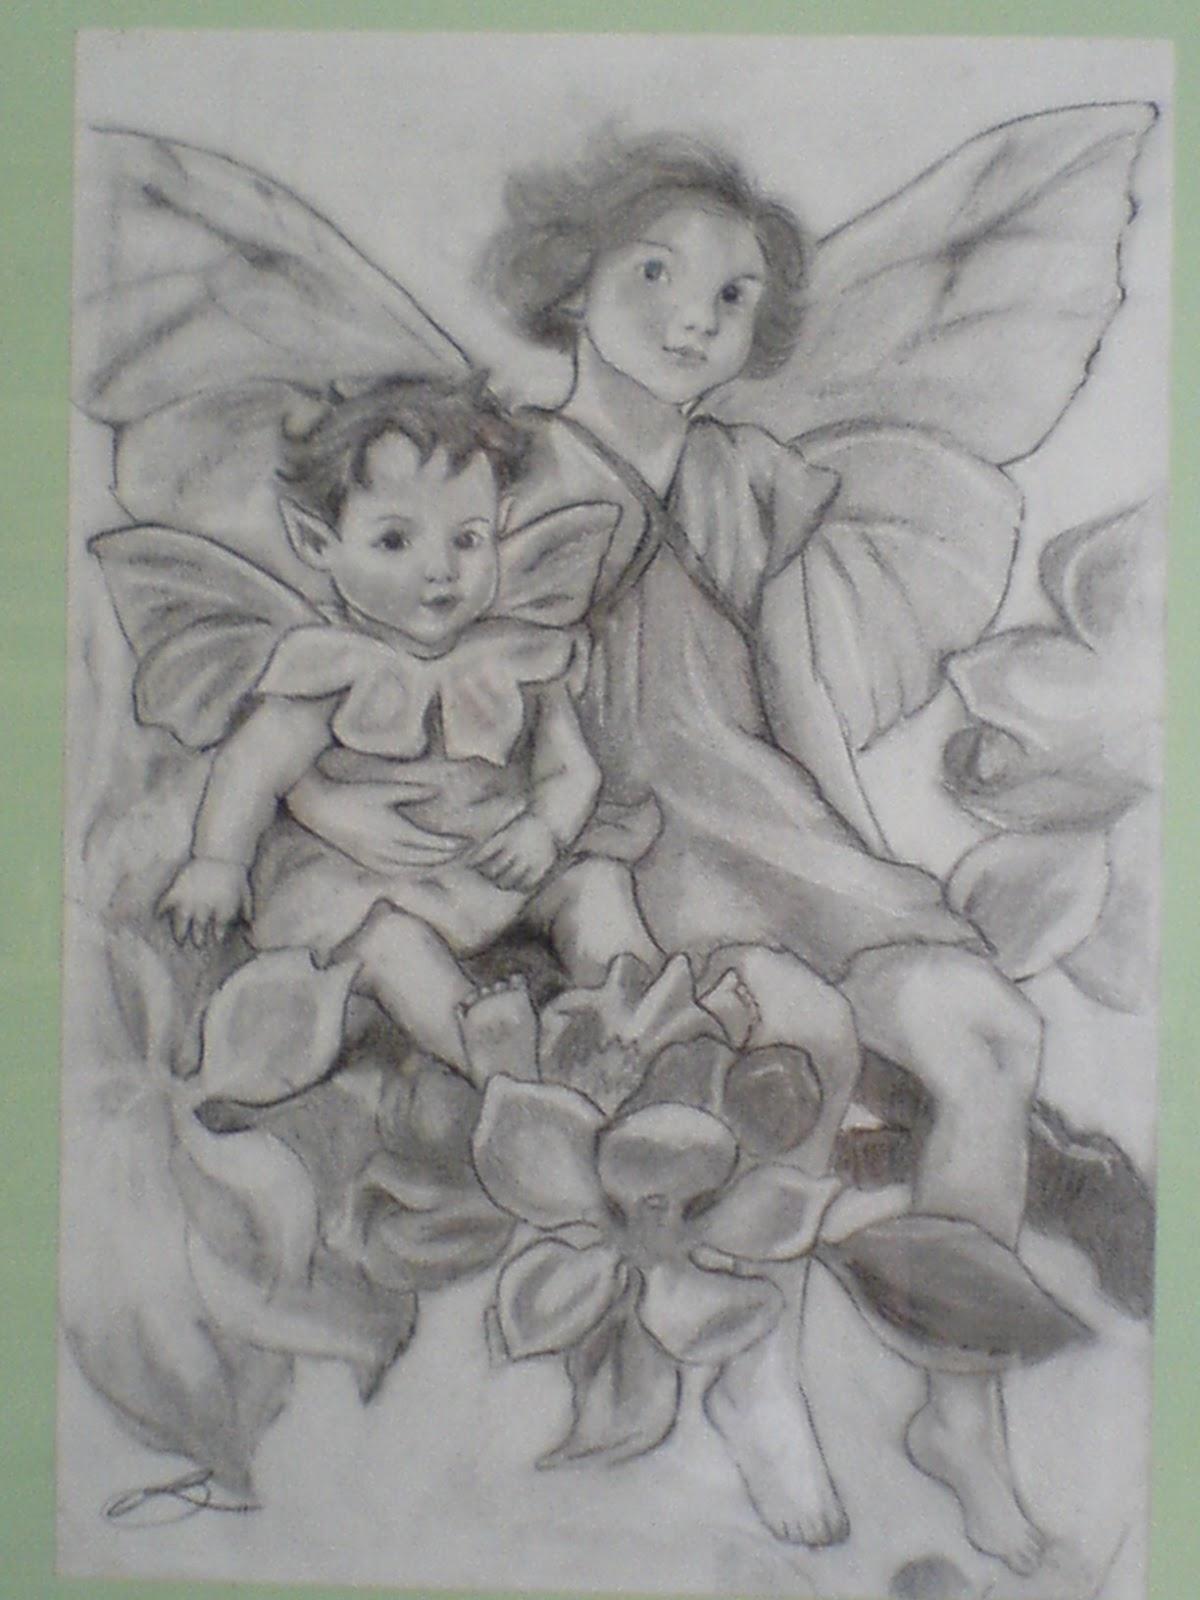 Hadas A Carboncillo Ilustradora Rosa Delia Medina Naranjo